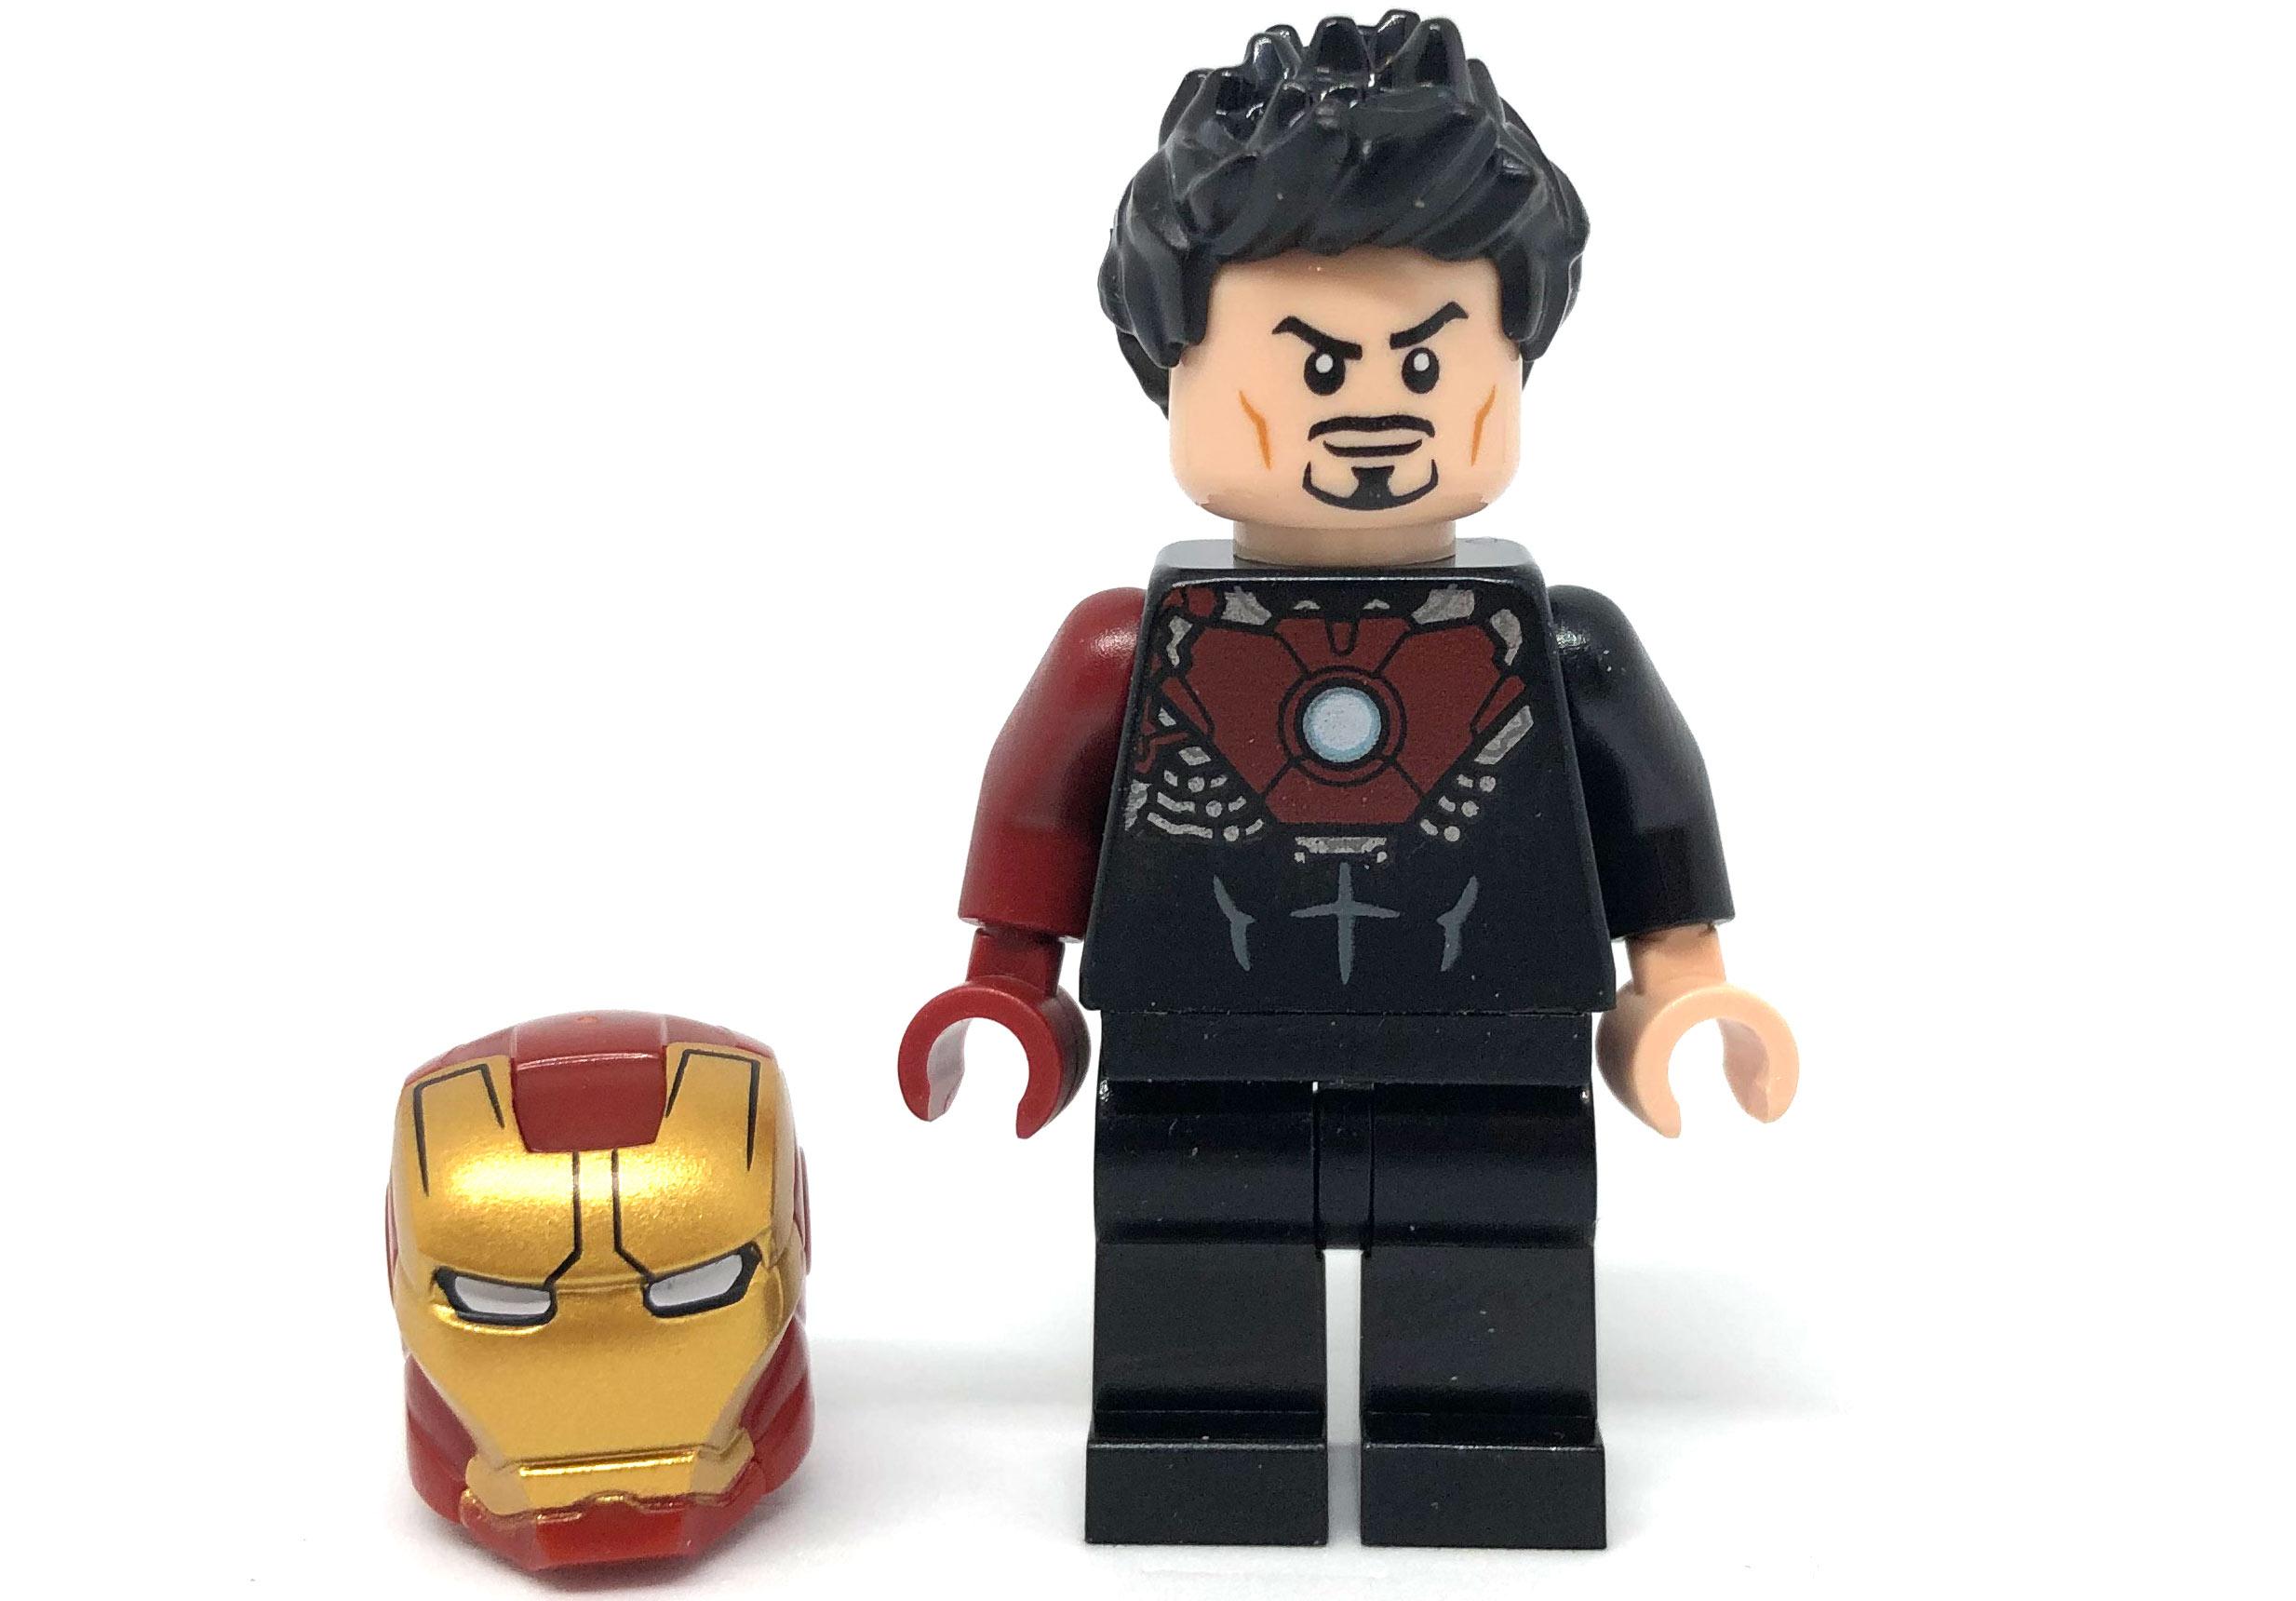 lego-marvel-avengers-tower-40334-2019-iron-man-tony-stark-minifigur-zusammengebaut-matthias-kuhnt zusammengebaut.com